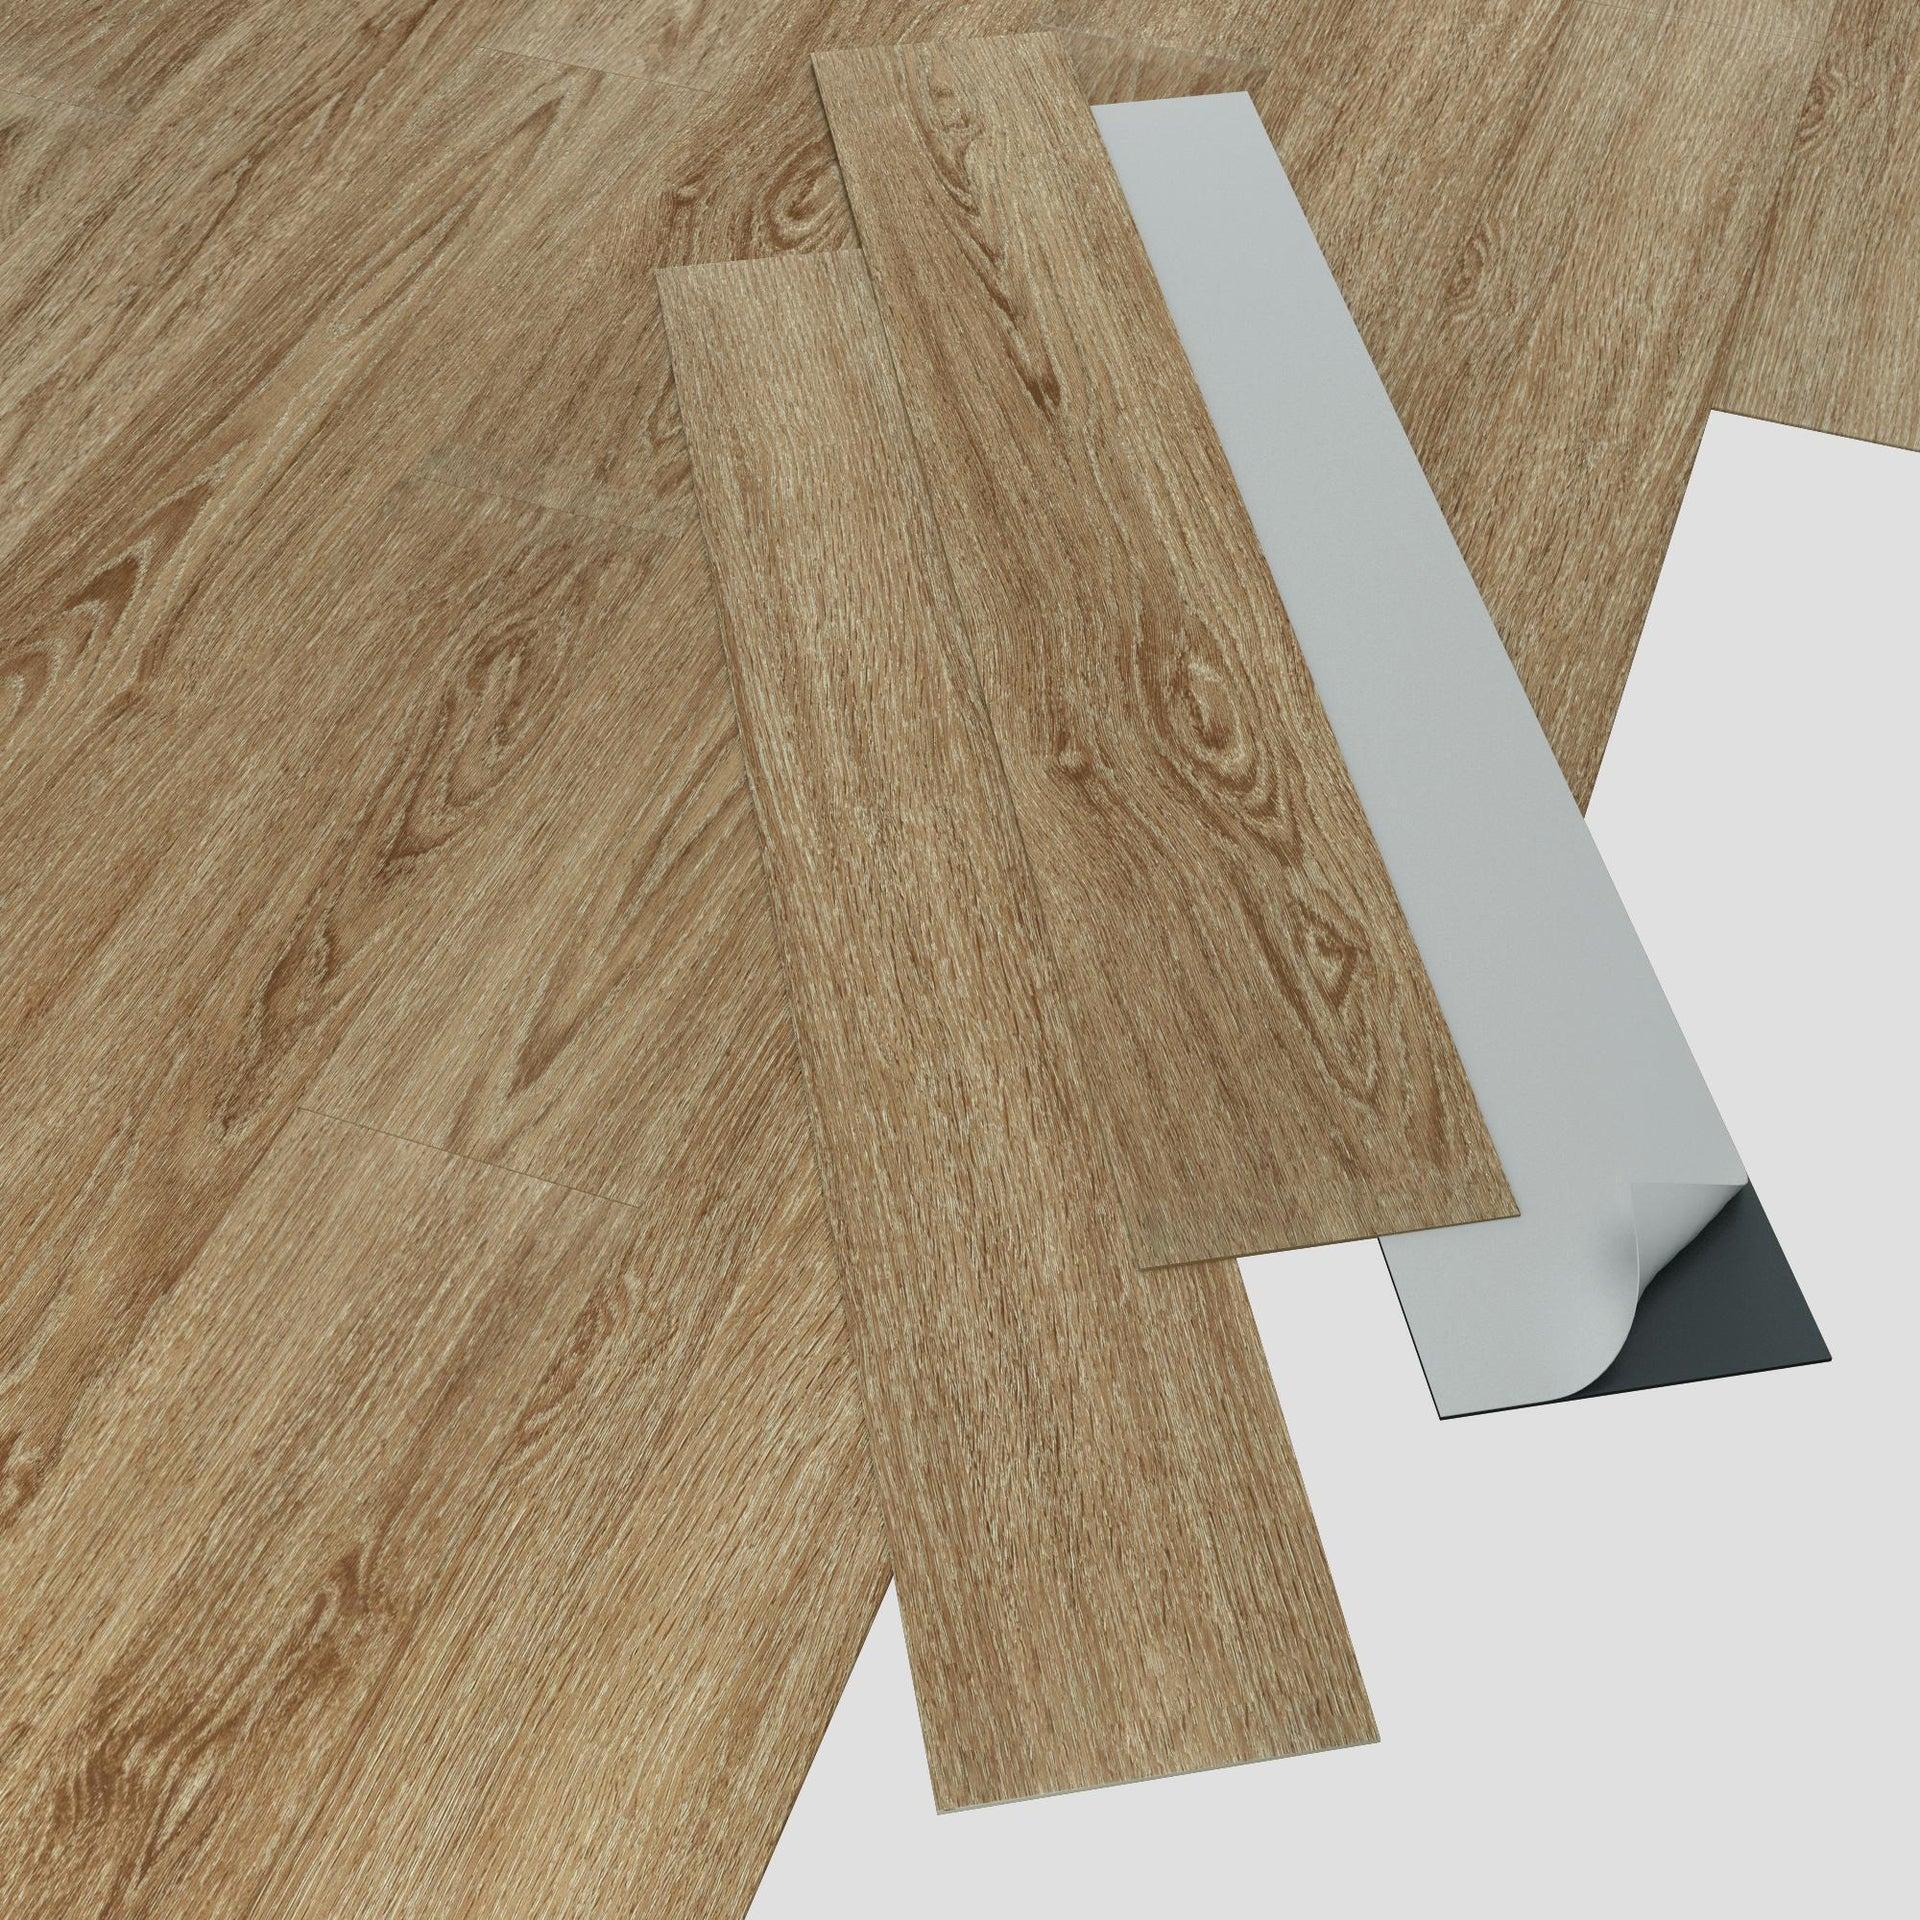 Pavimento PVC adesivo Sadema Sp 2 mm beige - 4